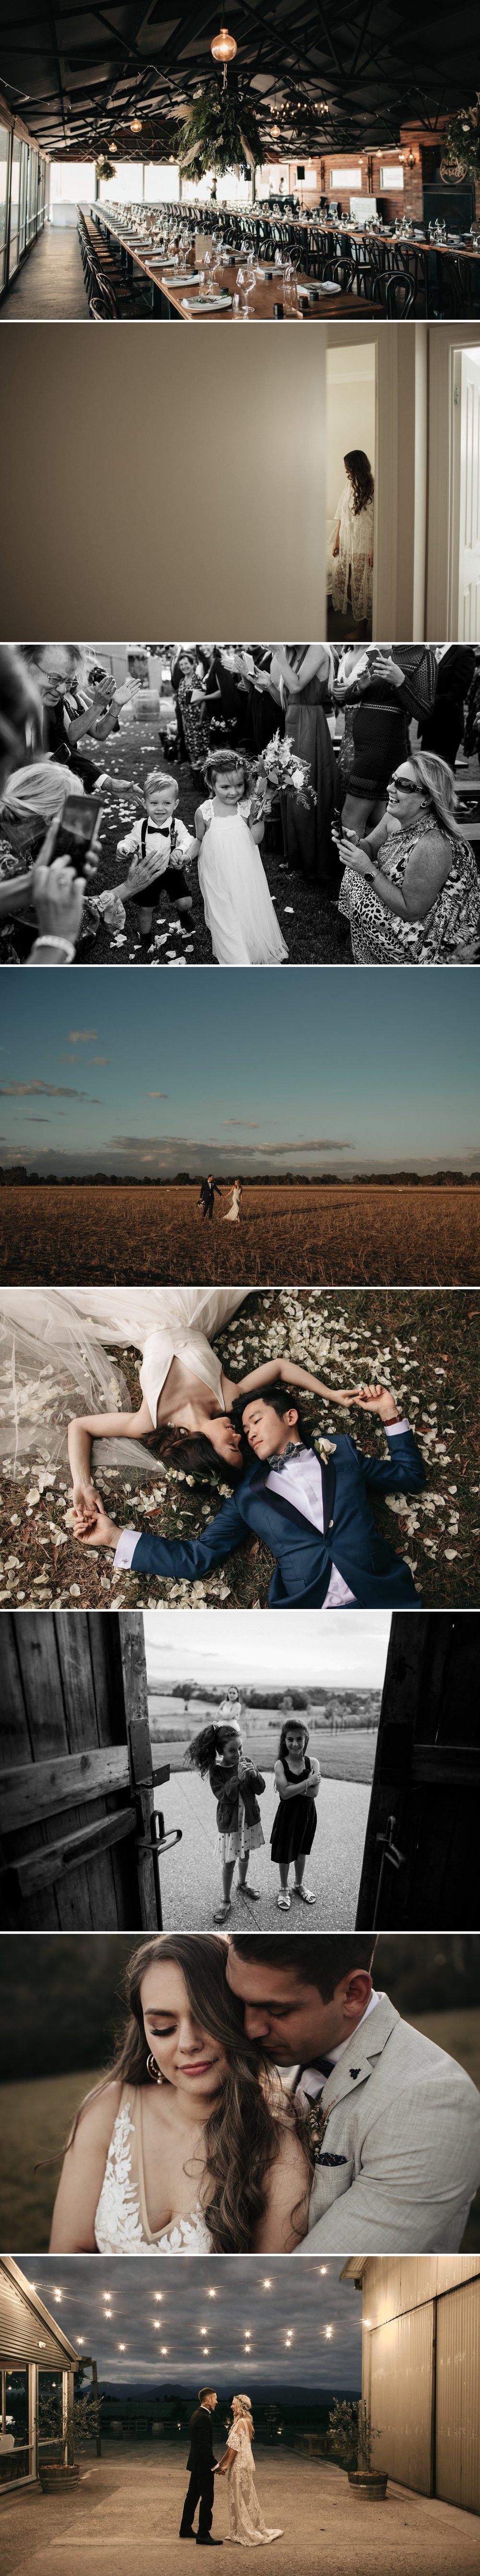 relaxed-wedding-photographer-melbourne_0003.jpg